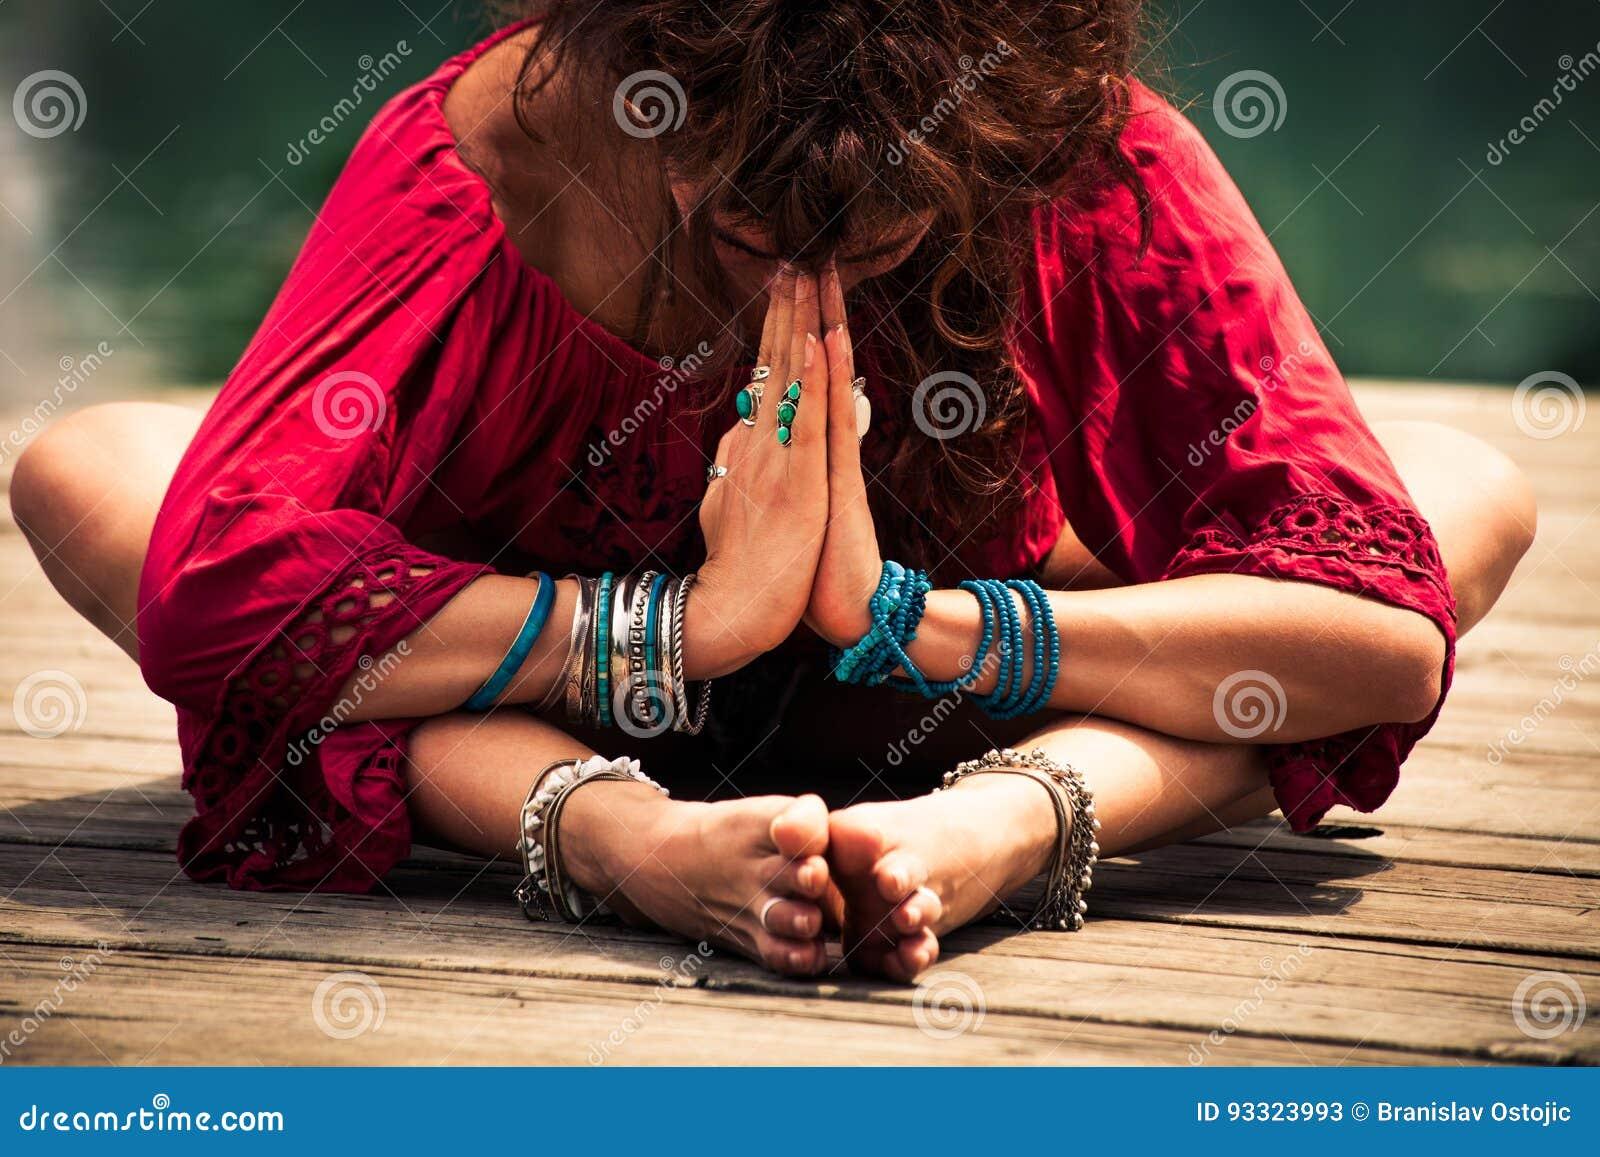 Woman in a meditative yoga position closeup